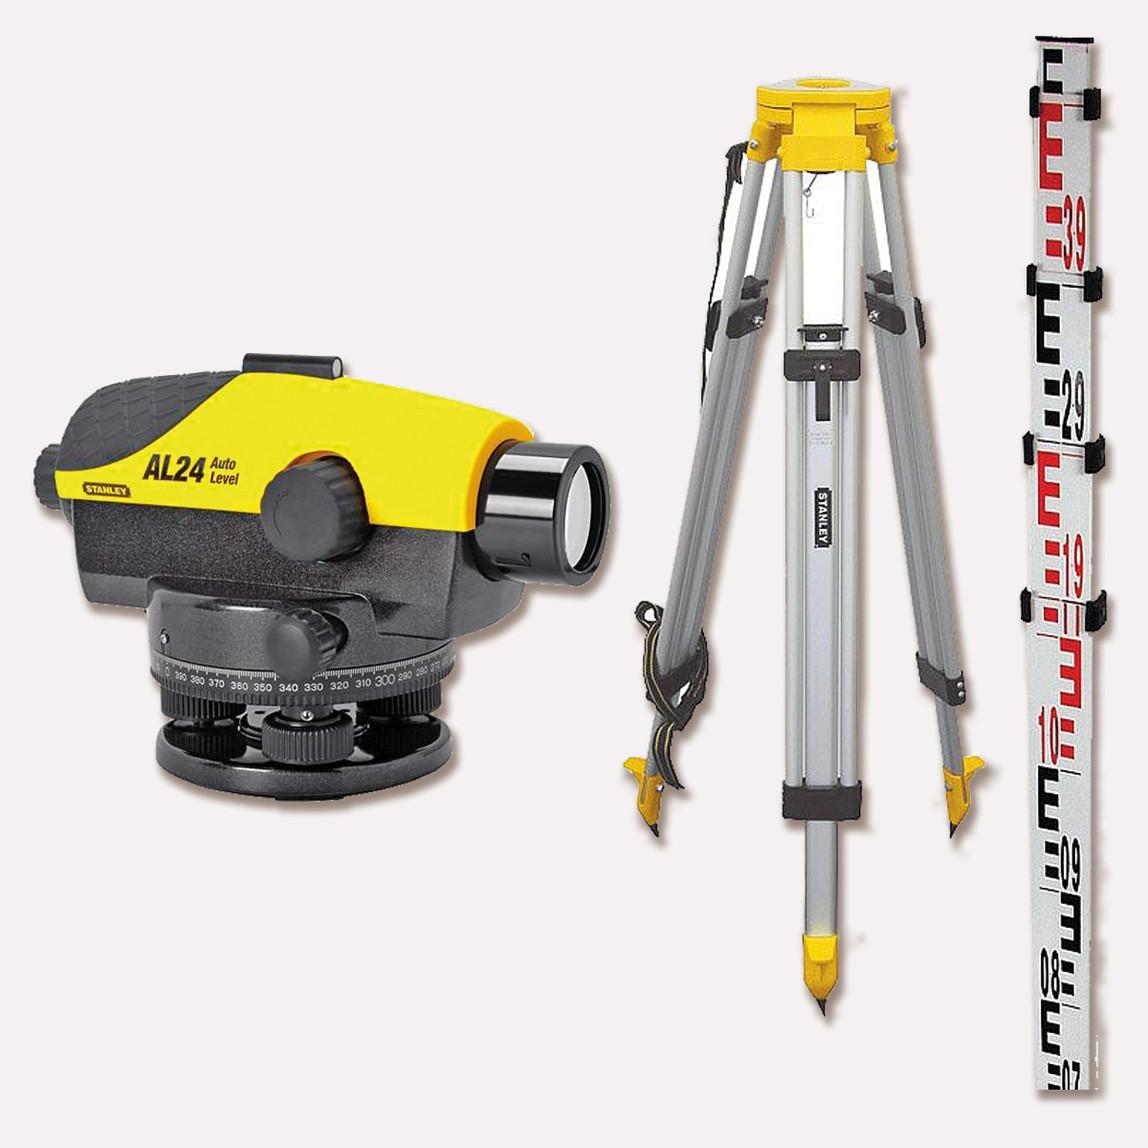 Stanley 1-77-160 AL 24GVP Lazer Optik Nivo